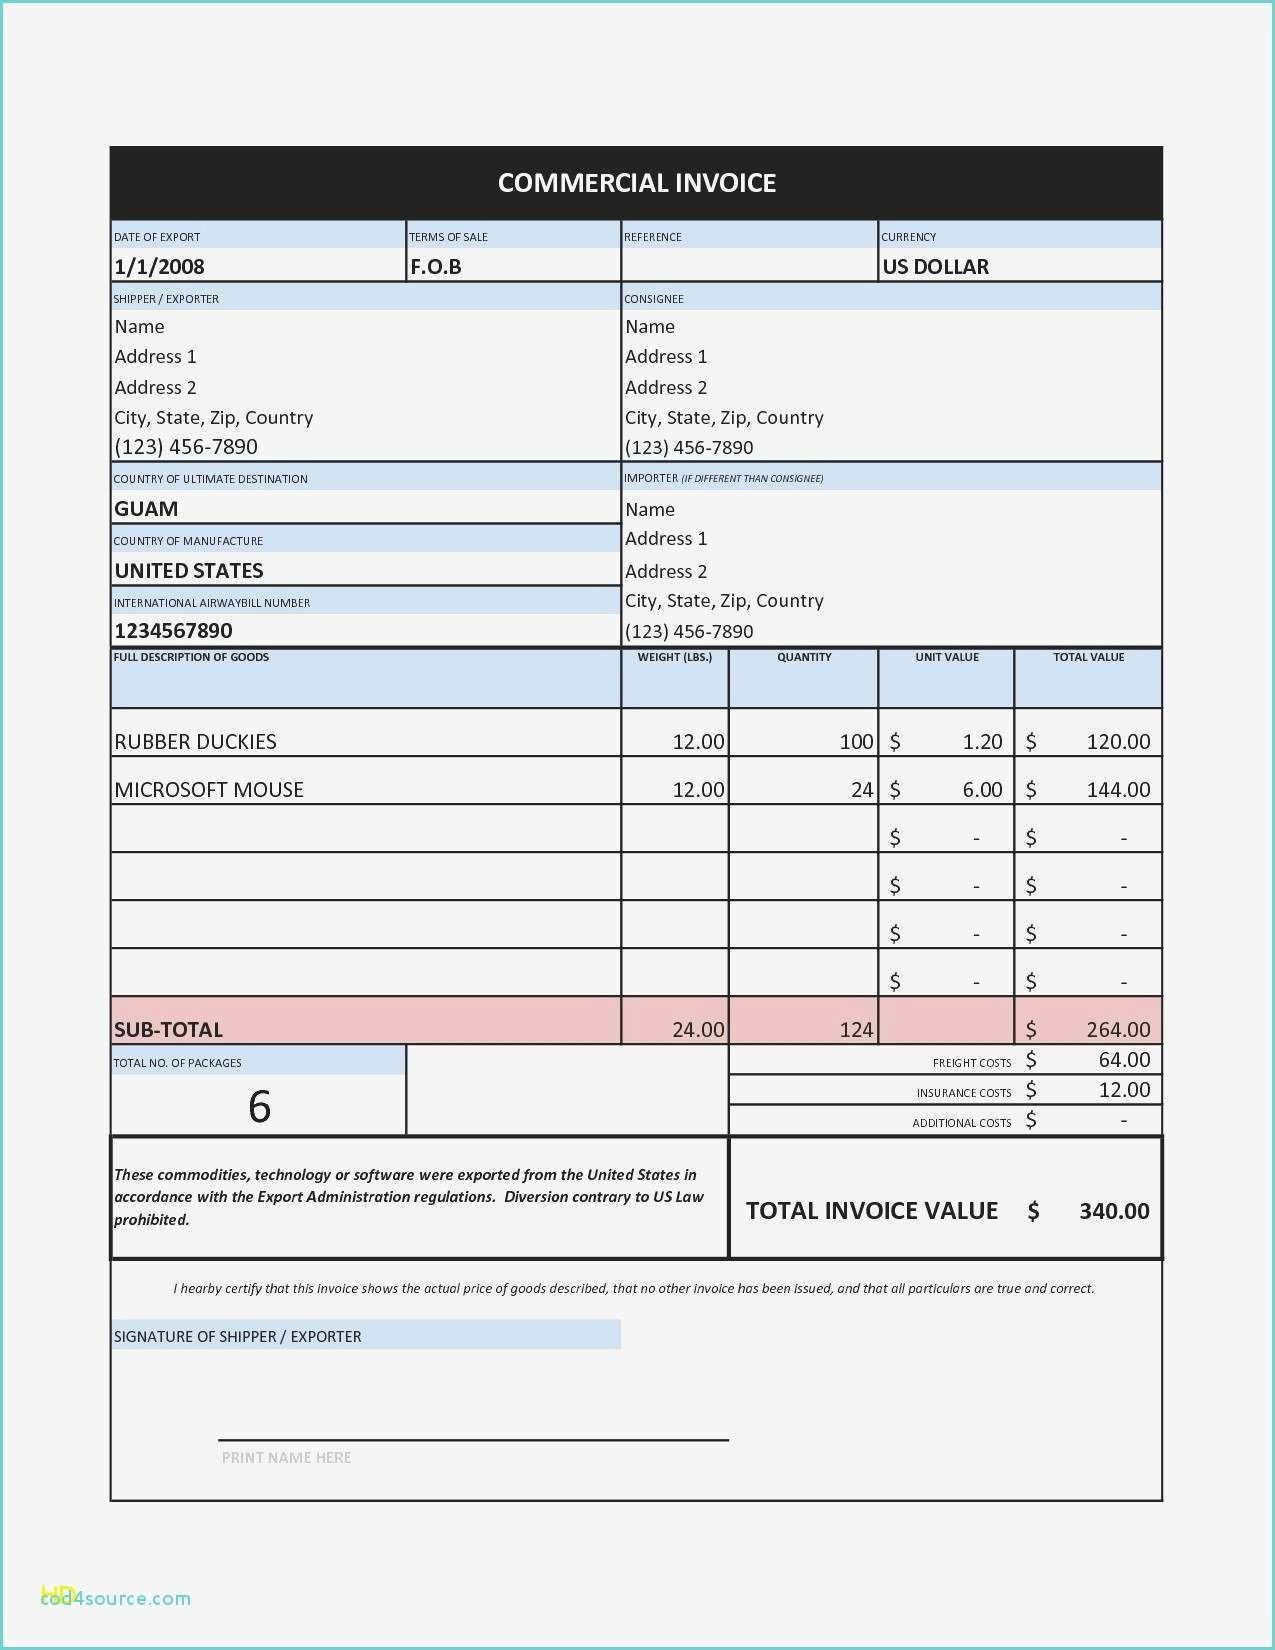 Free Invoice Templates Printable Of Free Printable Checks Template - Free Printable Checks